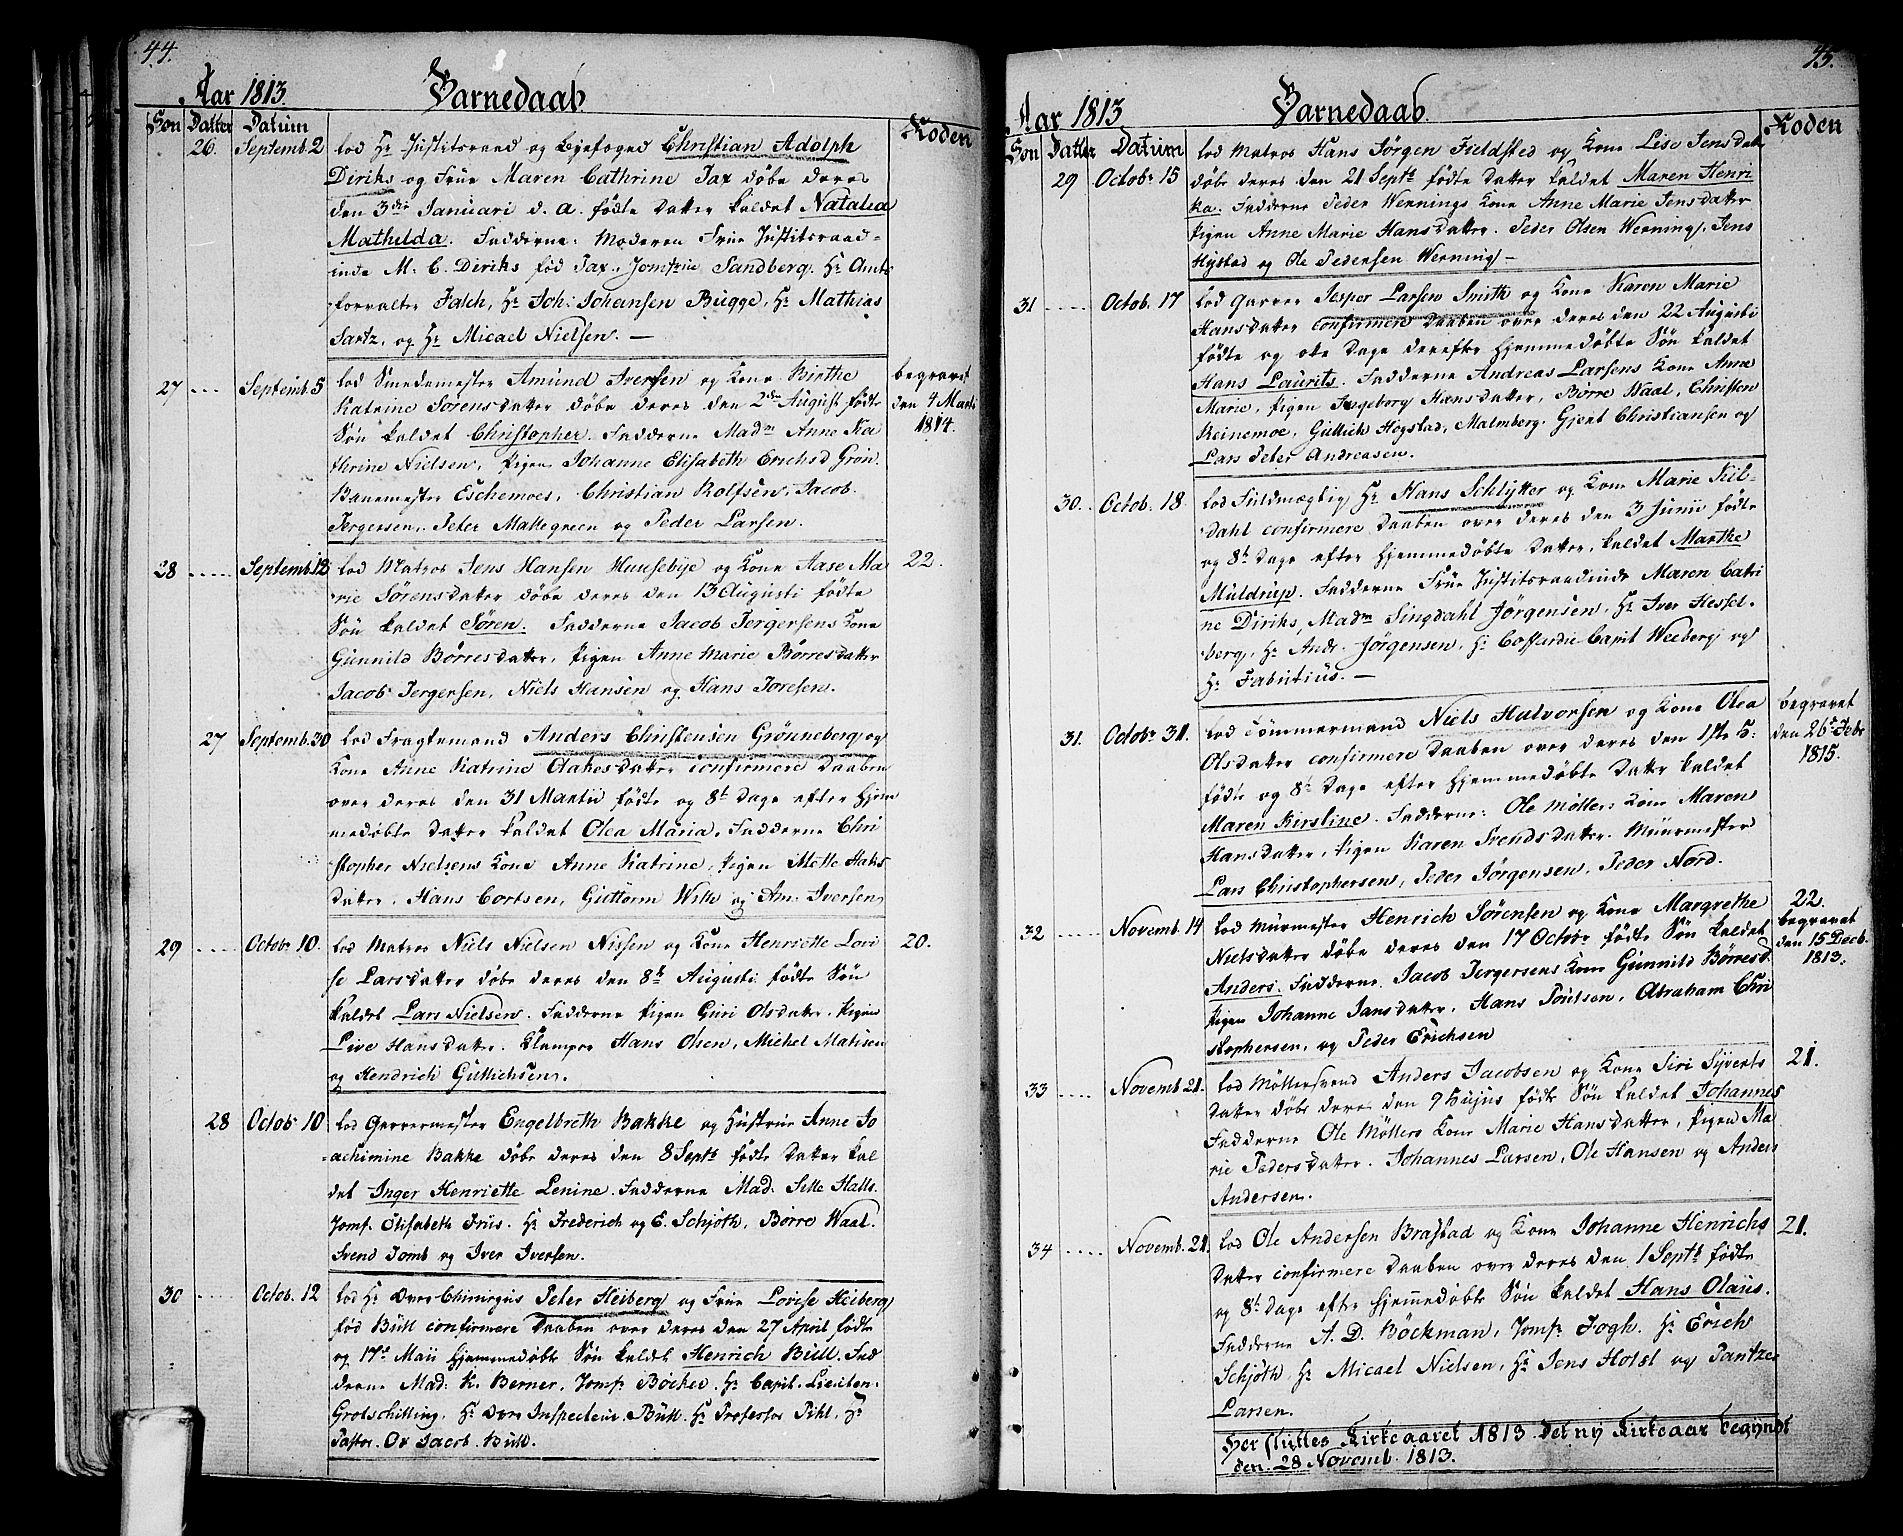 SAKO, Larvik kirkebøker, G/Ga/L0002: Klokkerbok nr. I 2, 1807-1830, s. 44-45